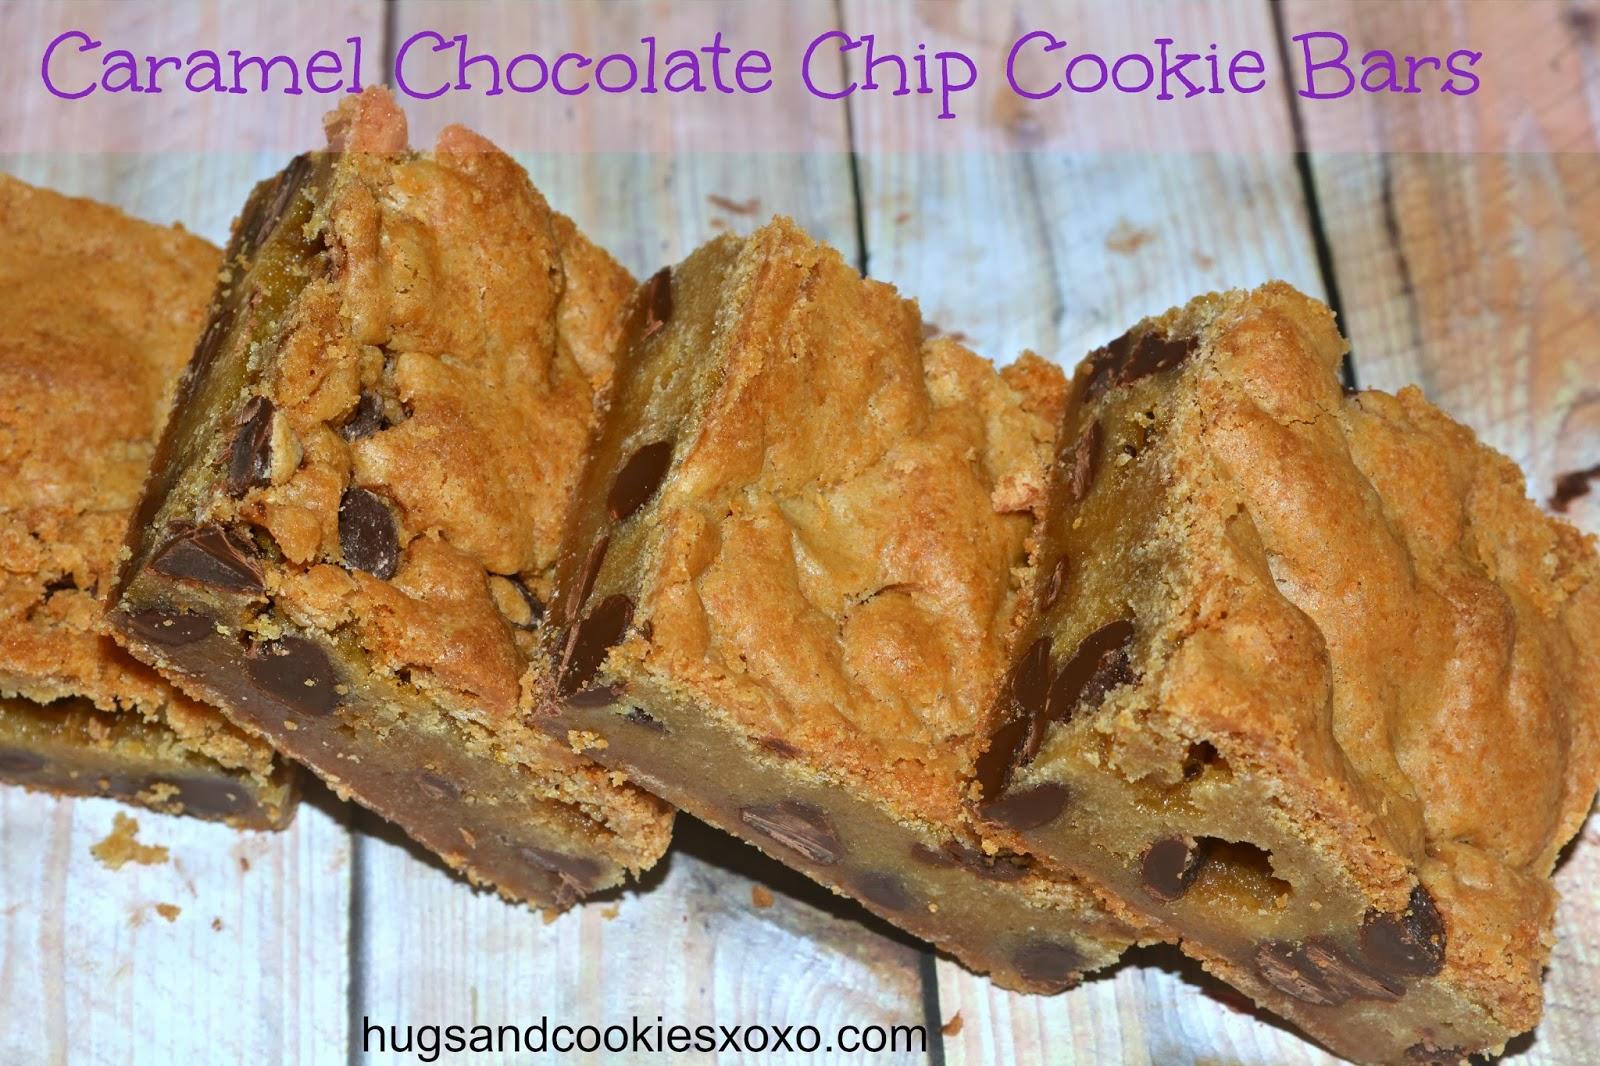 Oreo And Caramel Stuffed Chocolate Chip Cookie Bars Recipe ...